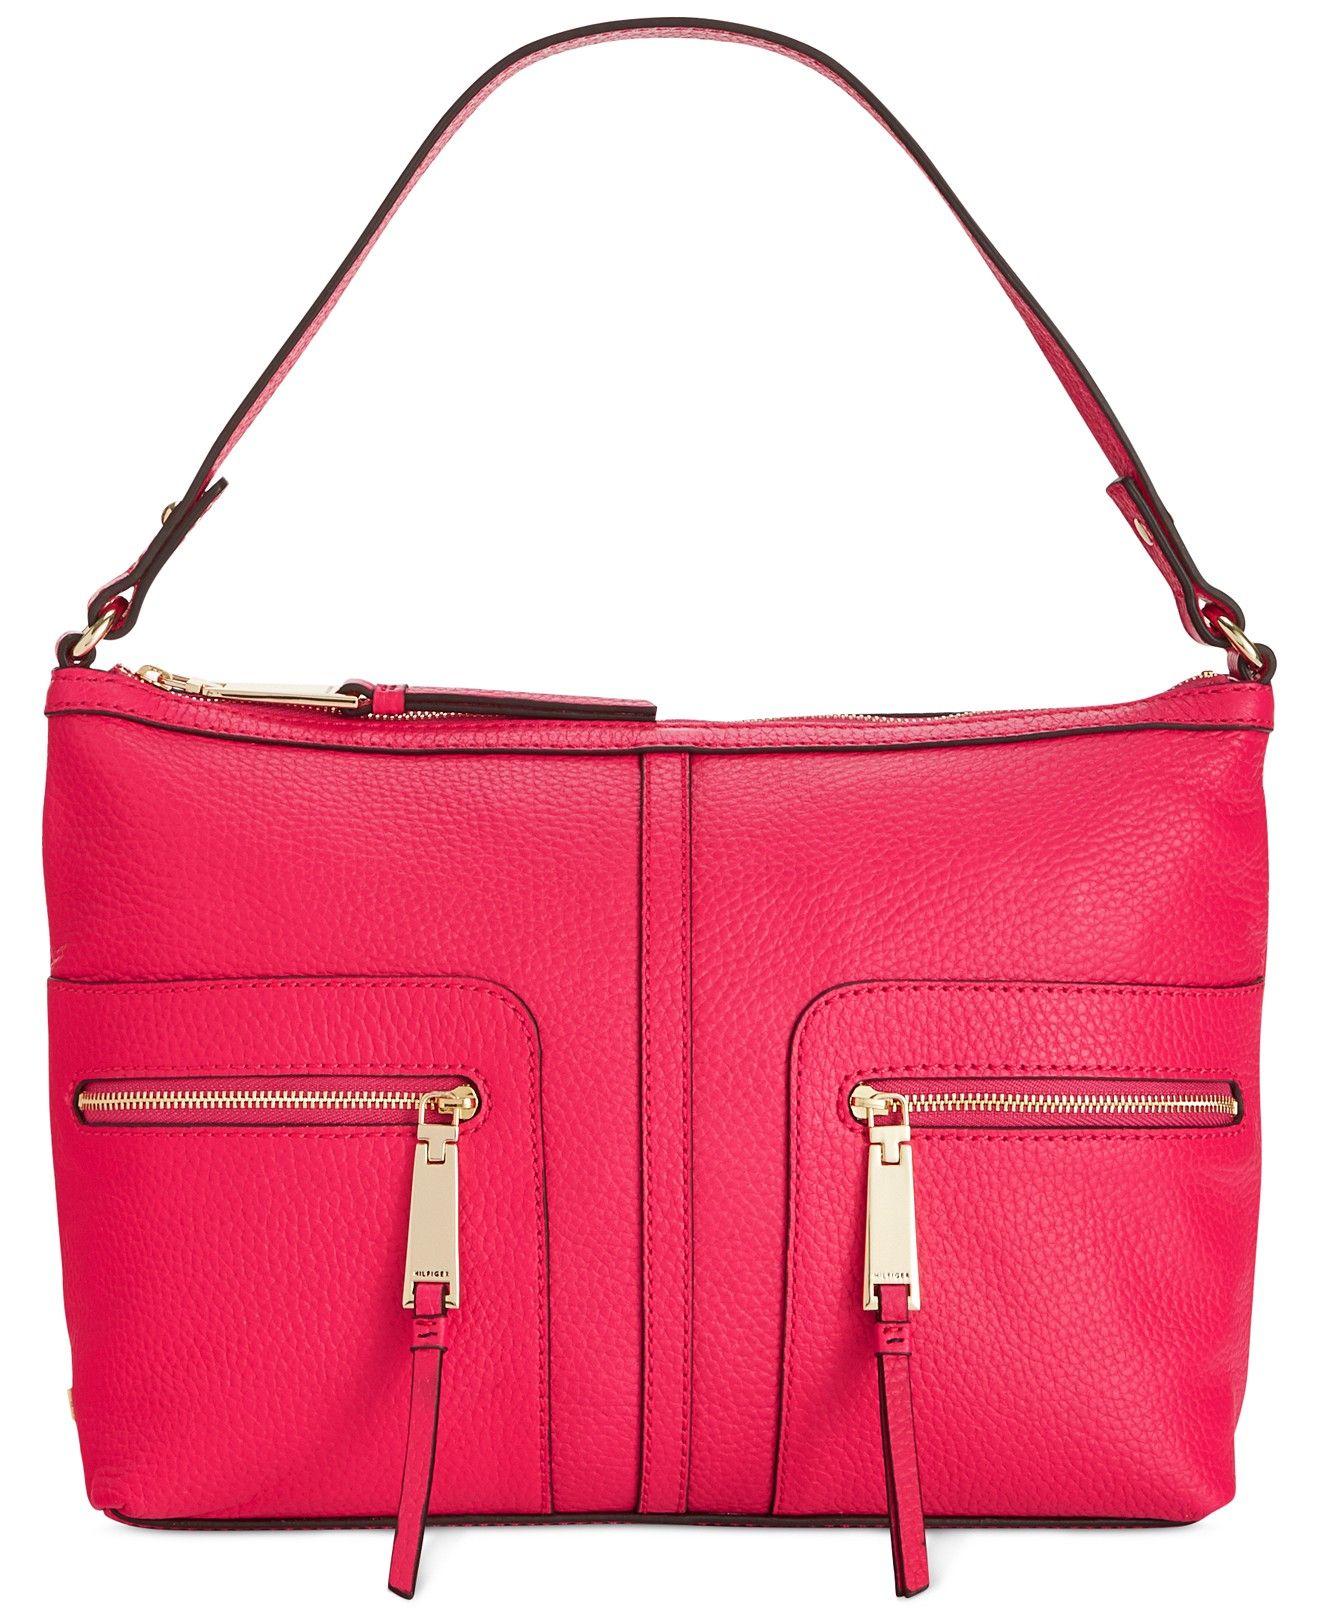 0f9ea1dc119 Tommy Hilfiger T-Group Pebble Leather Hobo - Hobo Bags - Handbags &  Accessories - Macy's